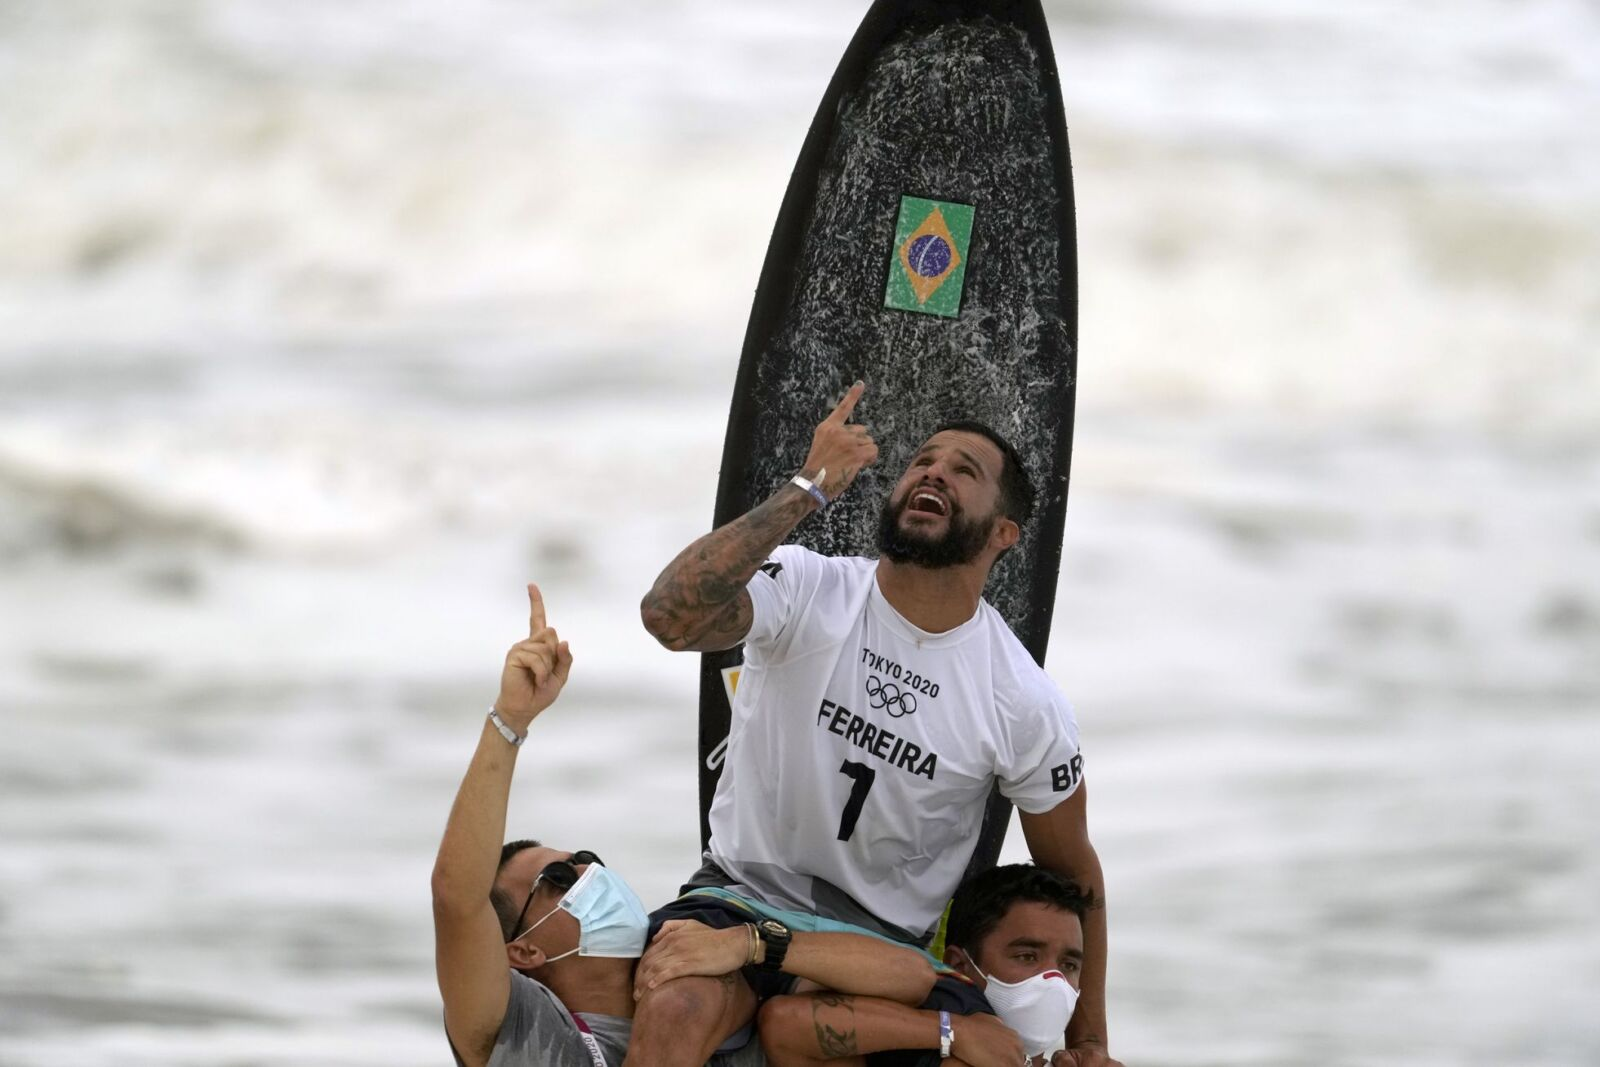 Surfista Ítalo Ferreira conquista primeiro ouro olímpico nos Jogos 2020